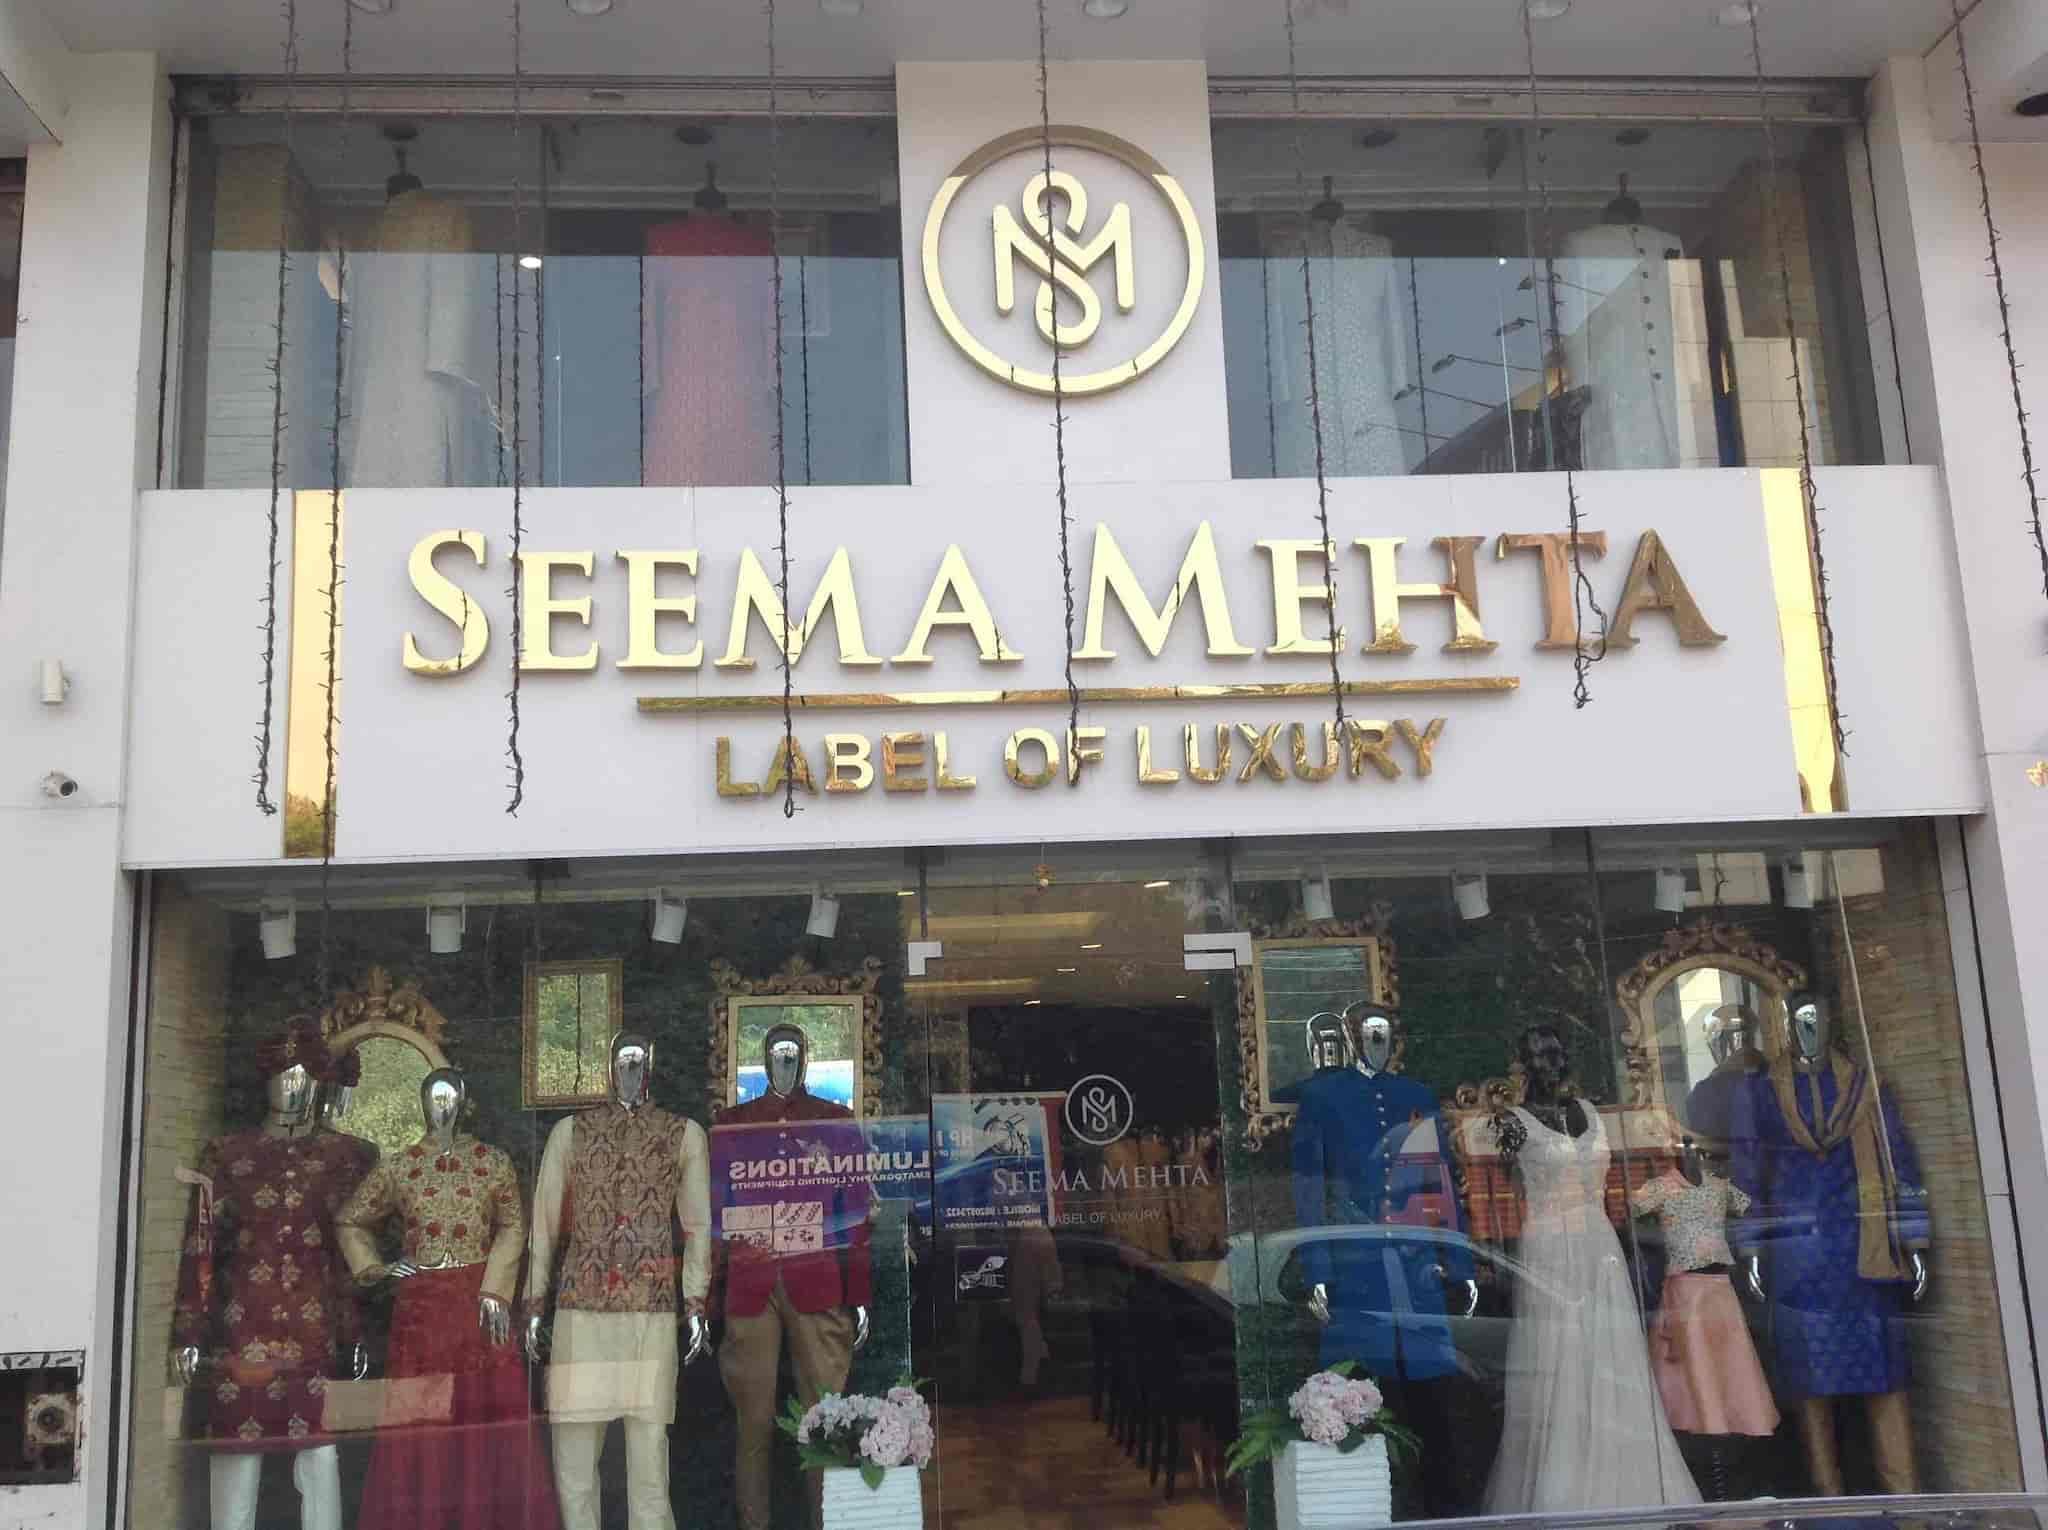 Seema Mehta Fashion Designer Juhu Fashion Designers In Mumbai Justdial